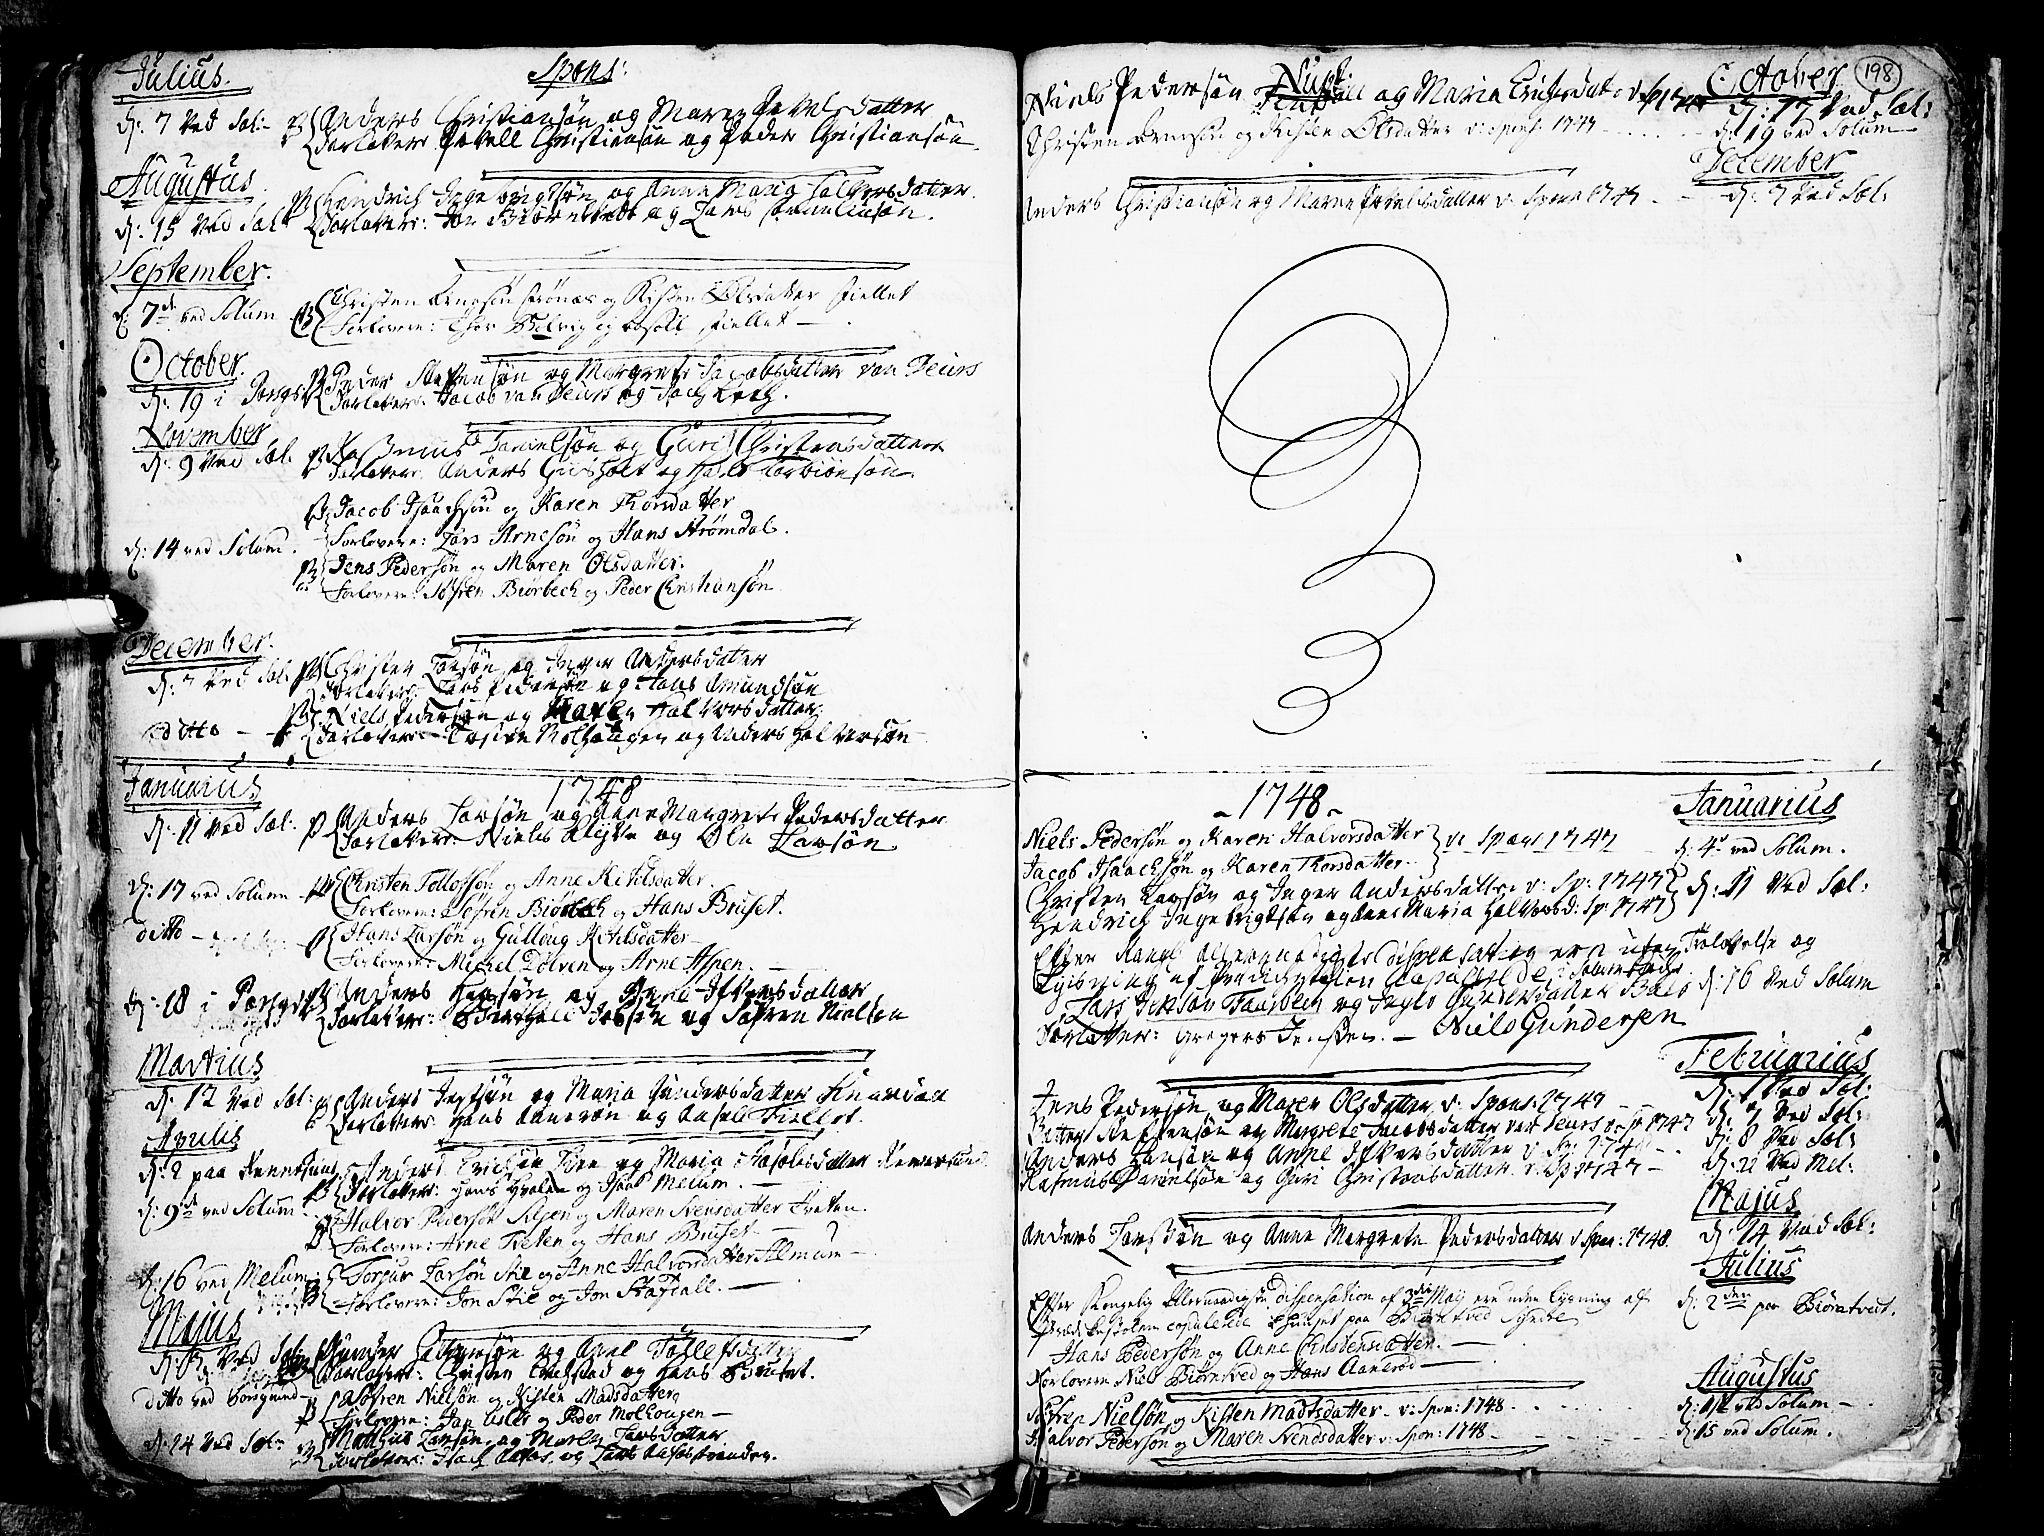 SAKO, Solum kirkebøker, F/Fa/L0002: Ministerialbok nr. I 2, 1713-1761, s. 198